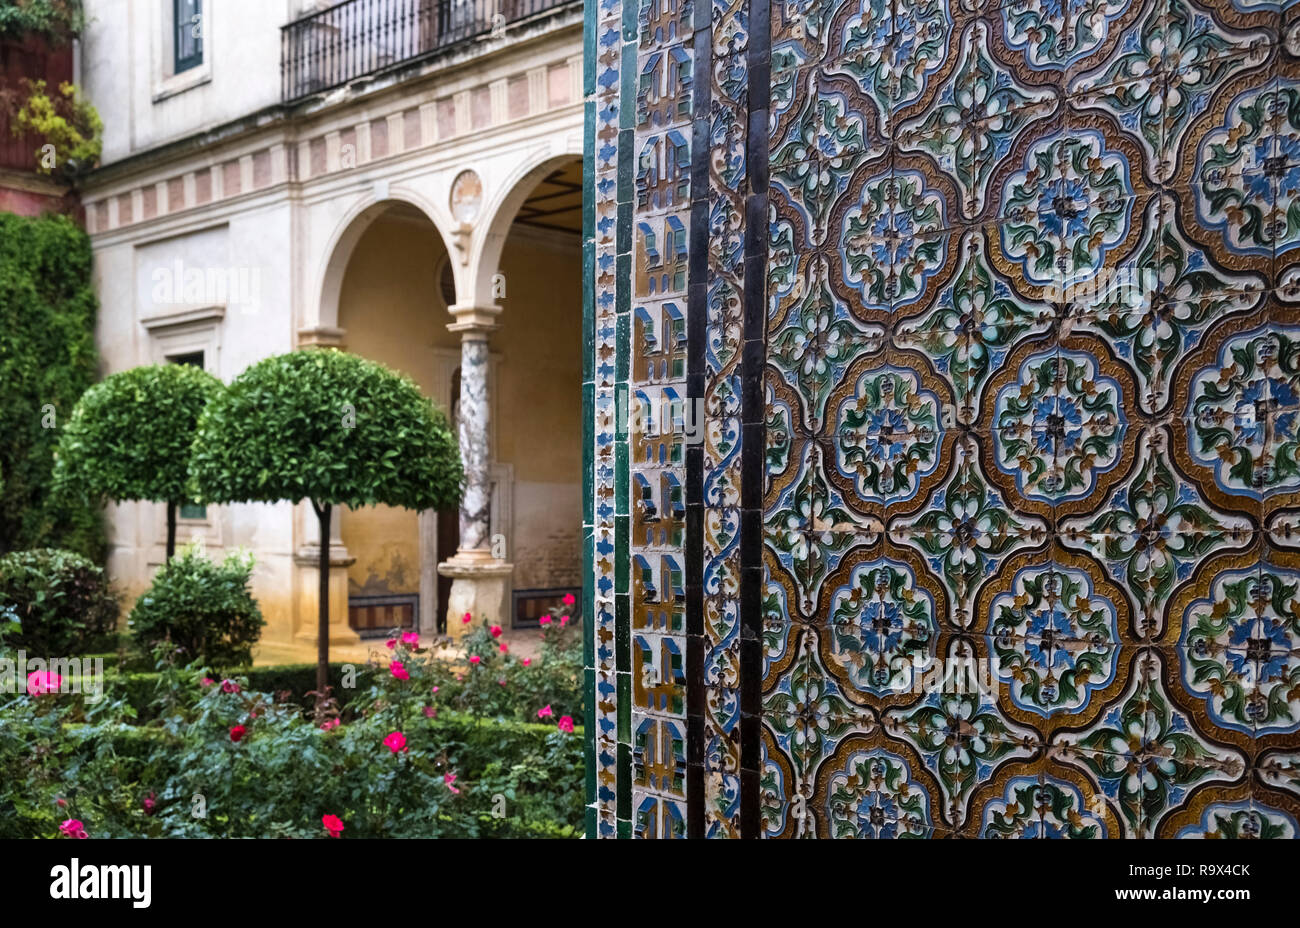 Wall tiles at Casa de Pilatos (Pilate's House), a Mudejar style palace used by the Dukes of Medinaceli, Seville, Spain Stock Photo